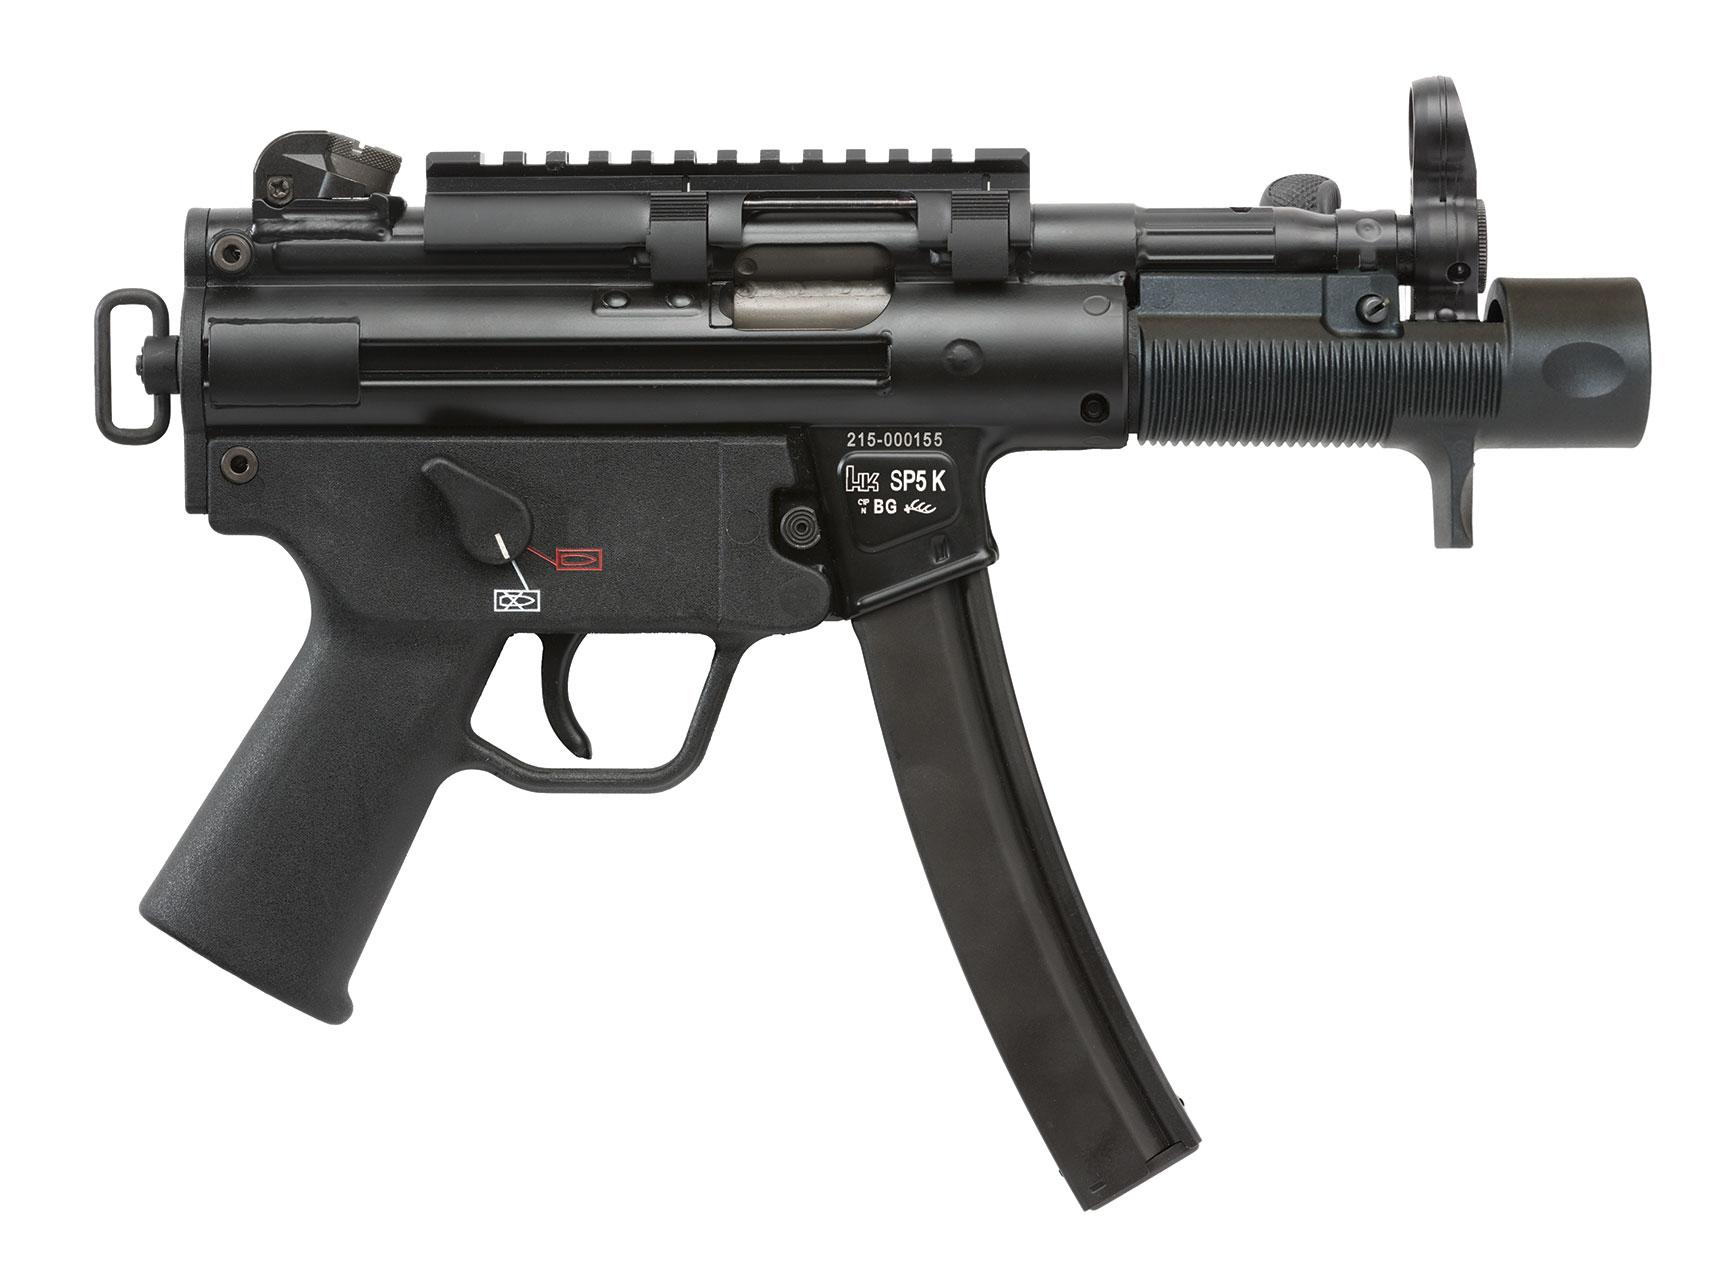 Heckler & Koch Guns: The 5 Best on the Planet